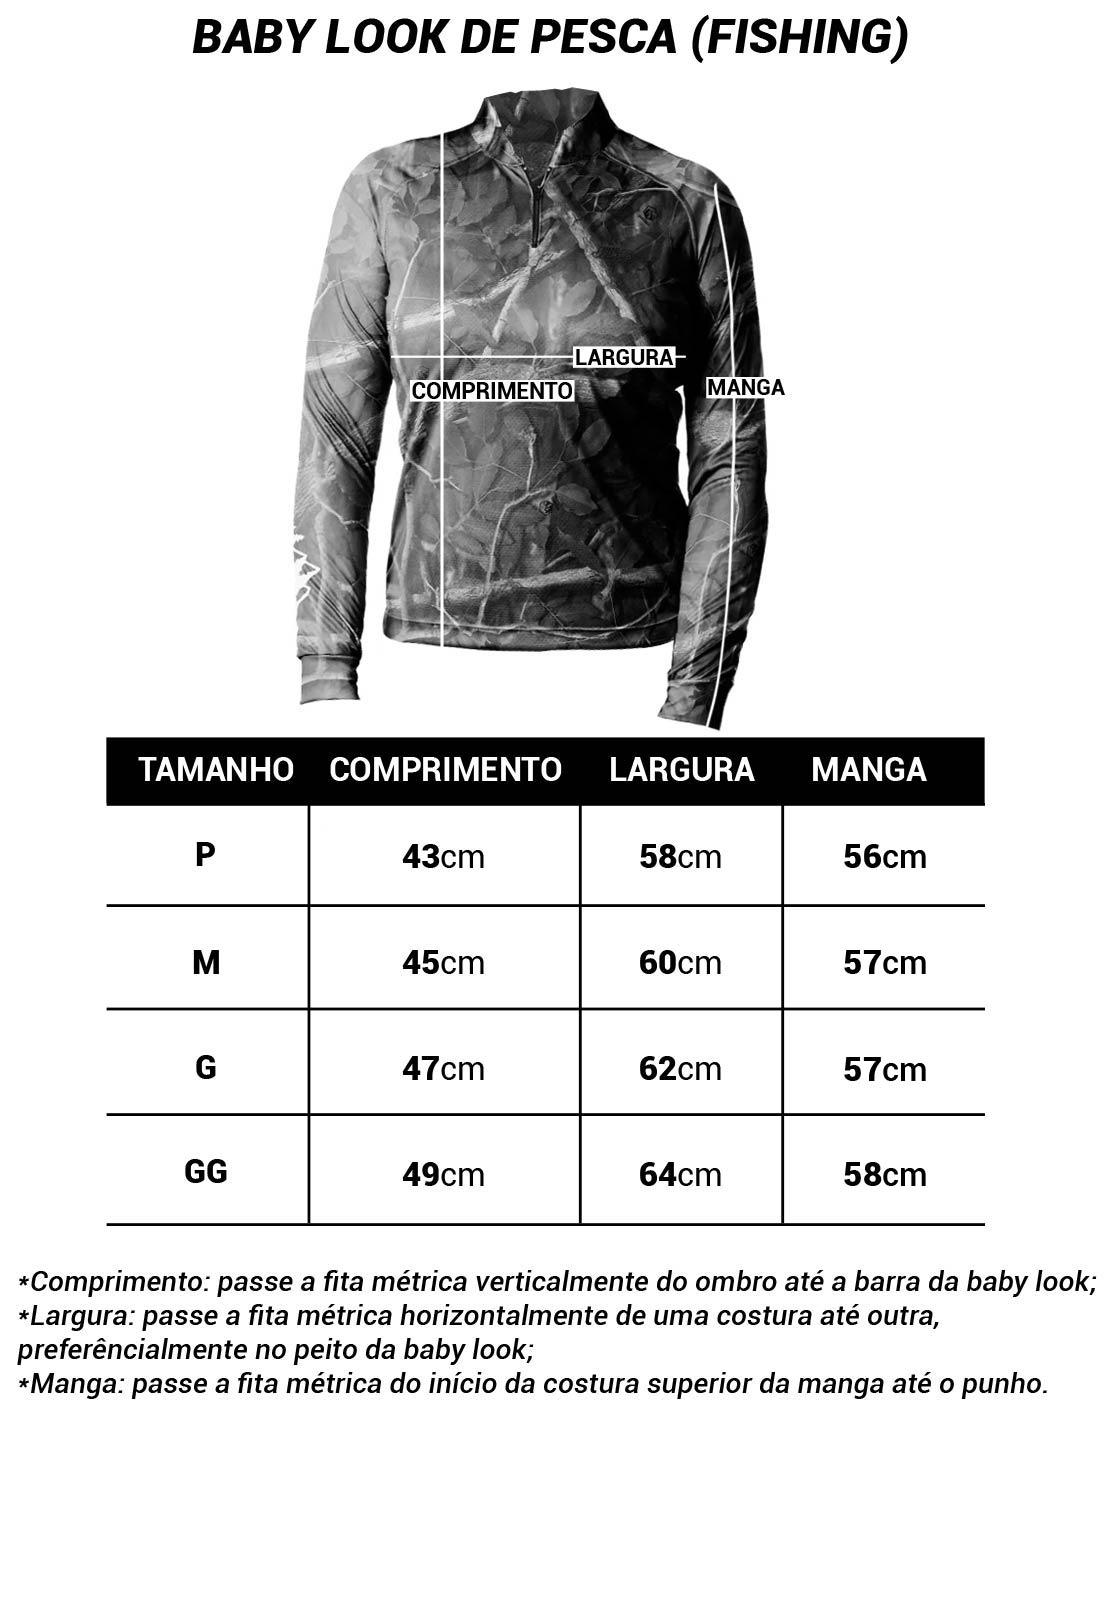 CAMISA DE PESCA FISH TECH PRO 12 FEMININA + BANDANA GRÁTIS  - REAL HUNTER OUTDOORS